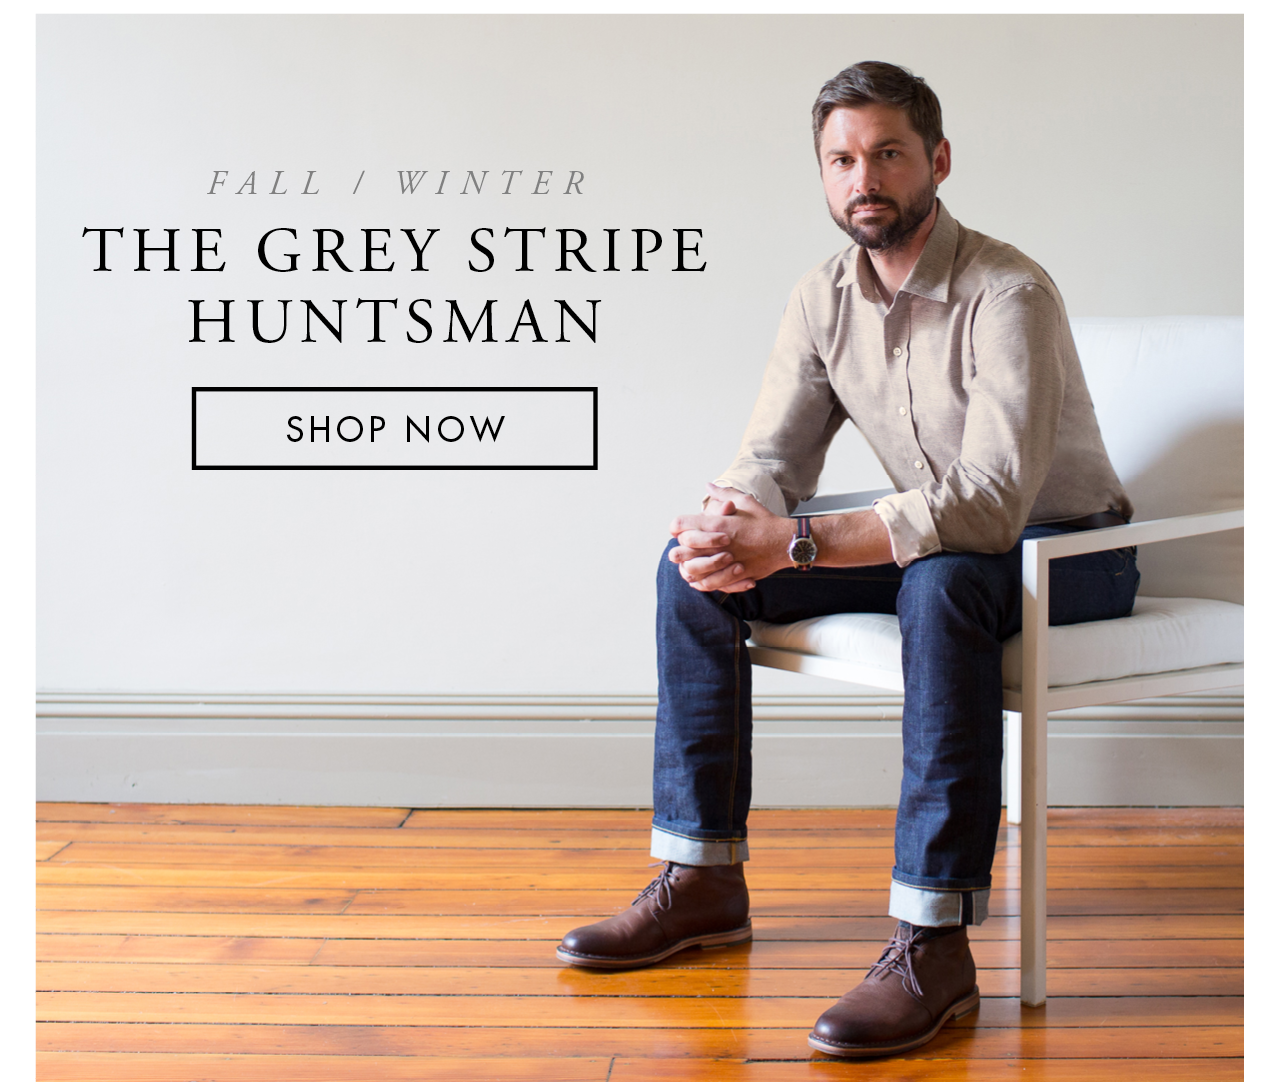 The Grey Stripe Hunstsman